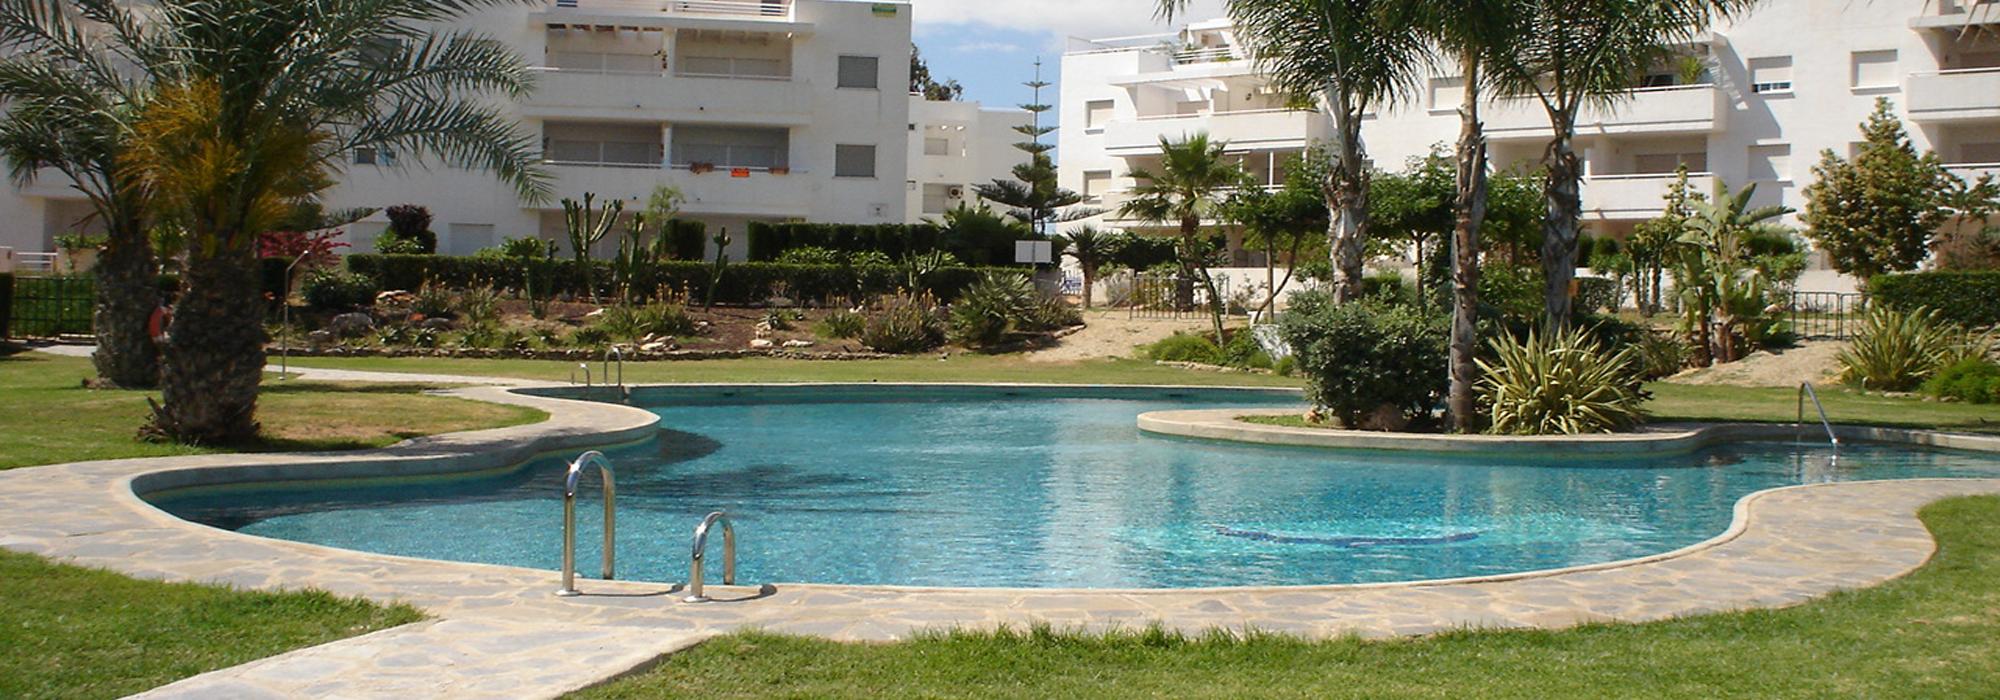 Apartamento. Bergantín. Puerto Rey. Vera Playa